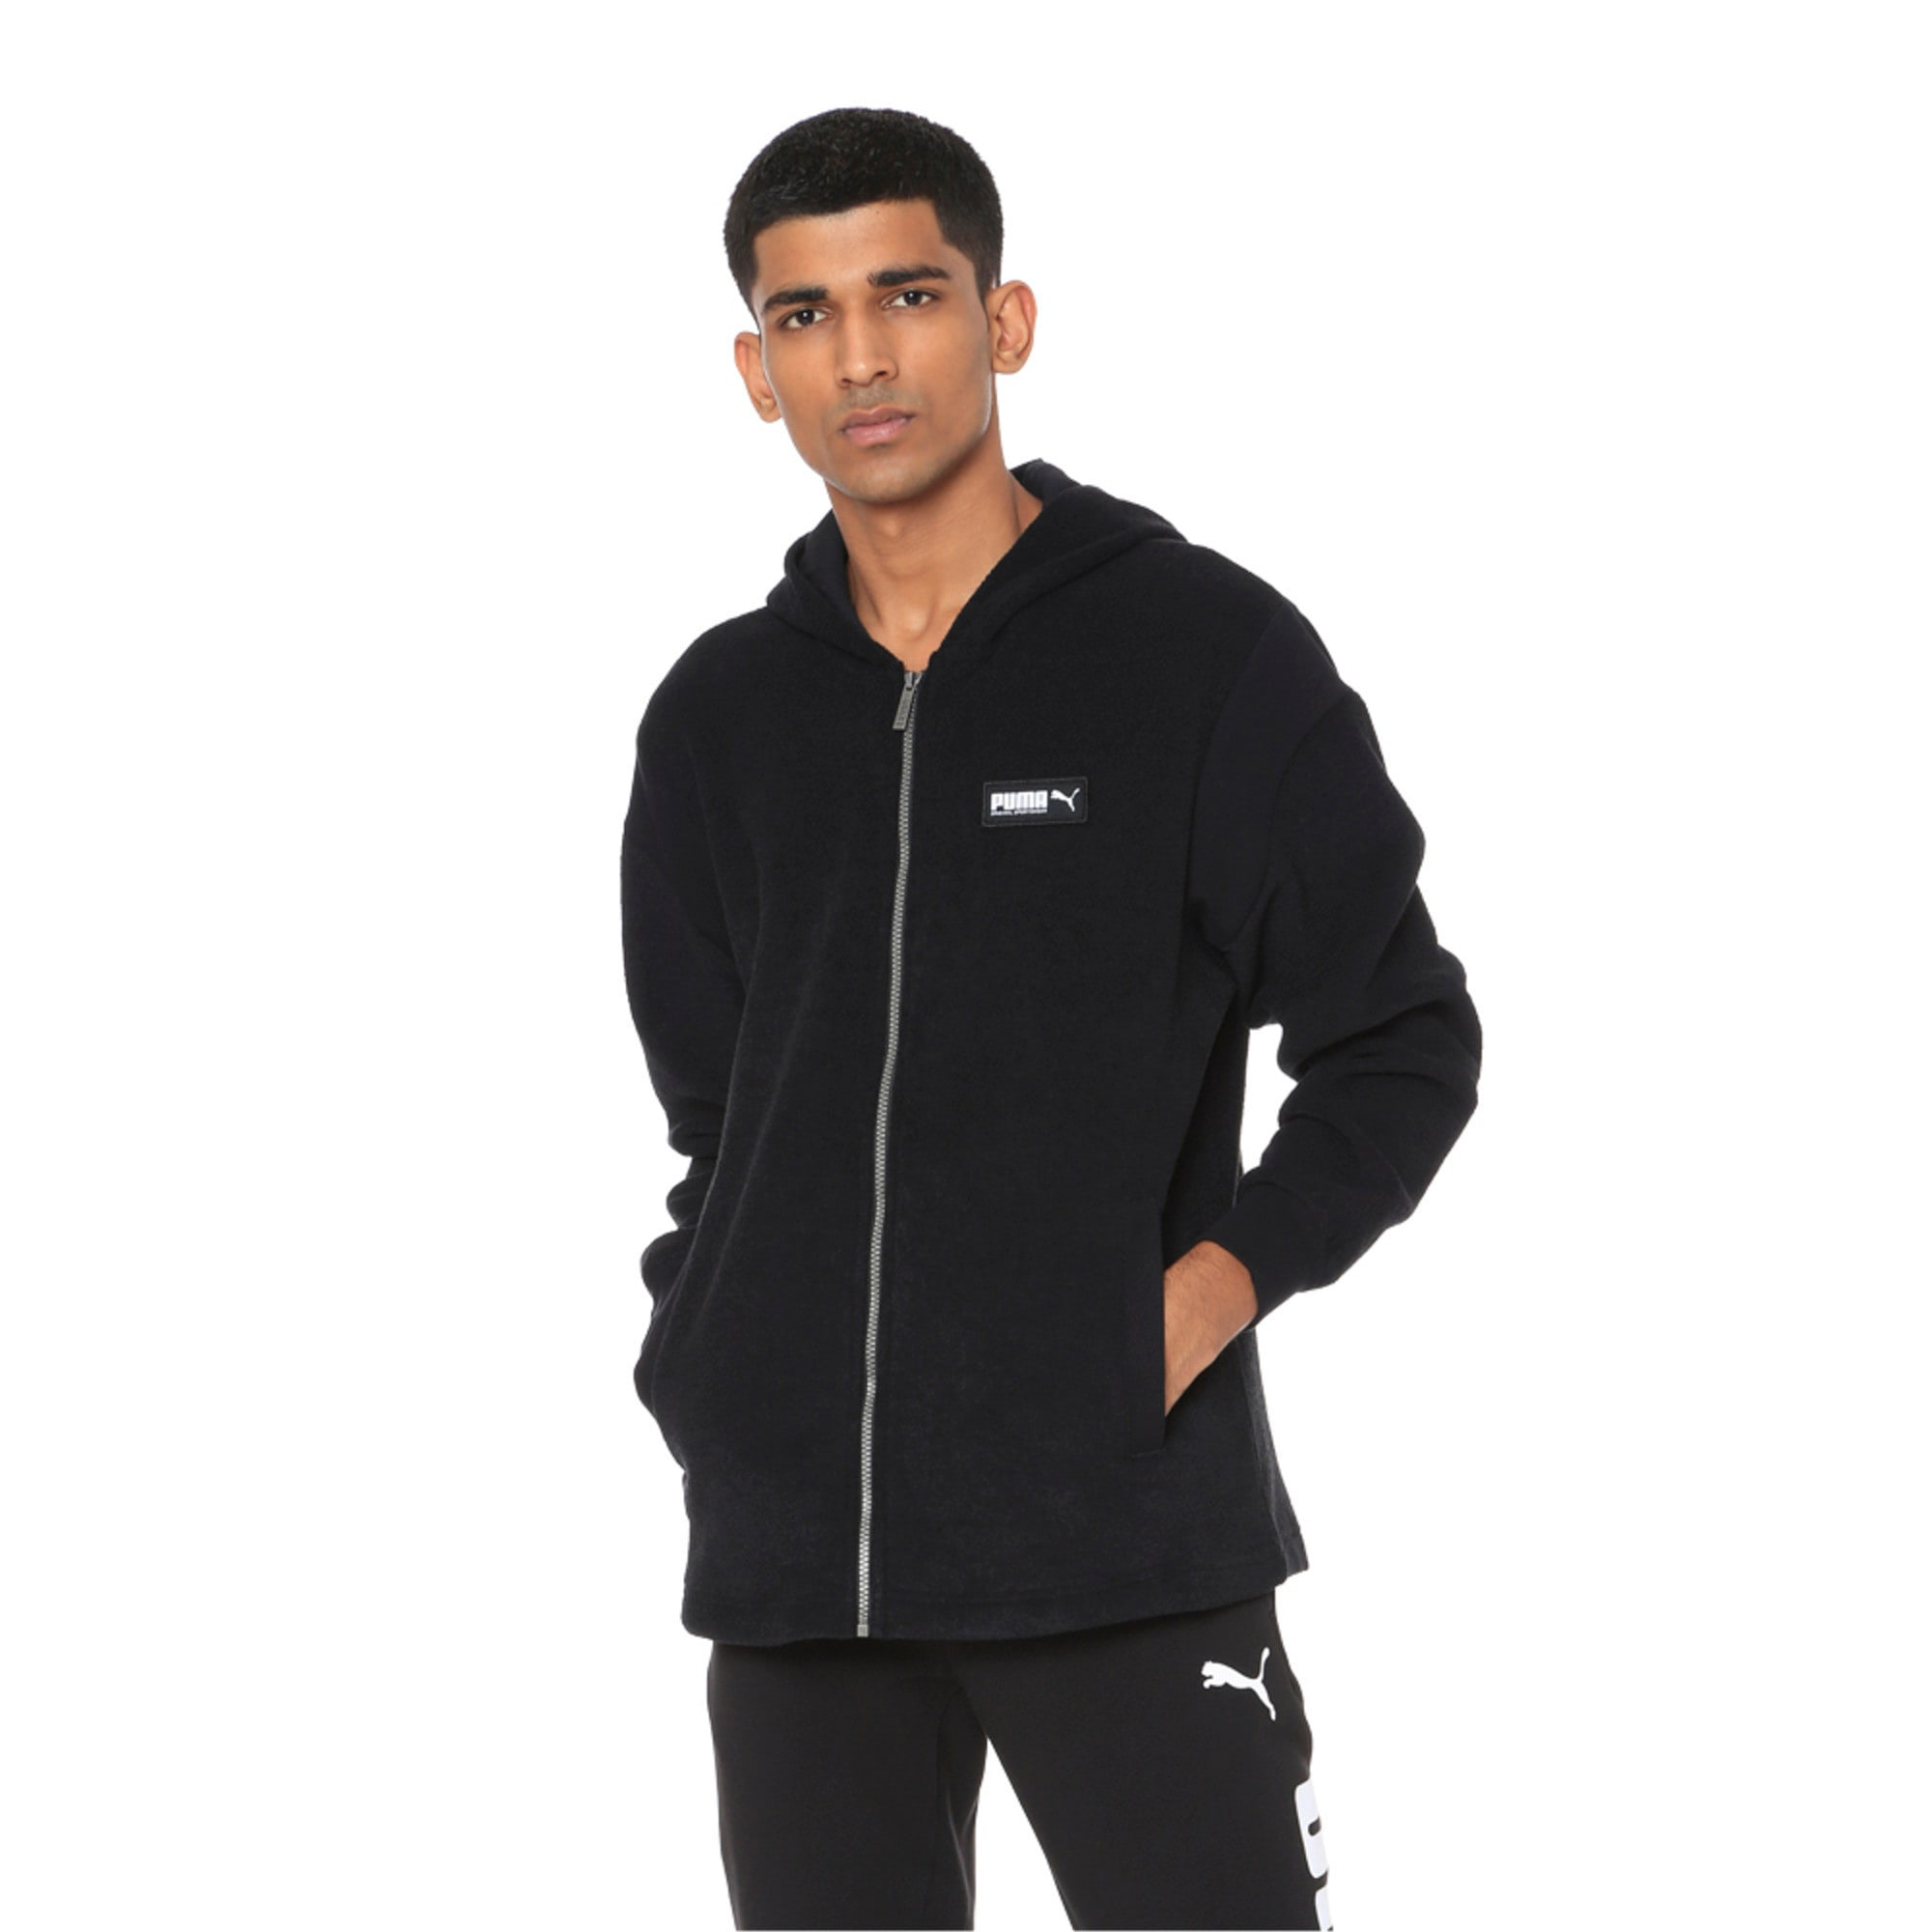 Thumbnail 3 of Fusion Fleece Hooded Men's Sweat Jacket, Puma Black, medium-IND